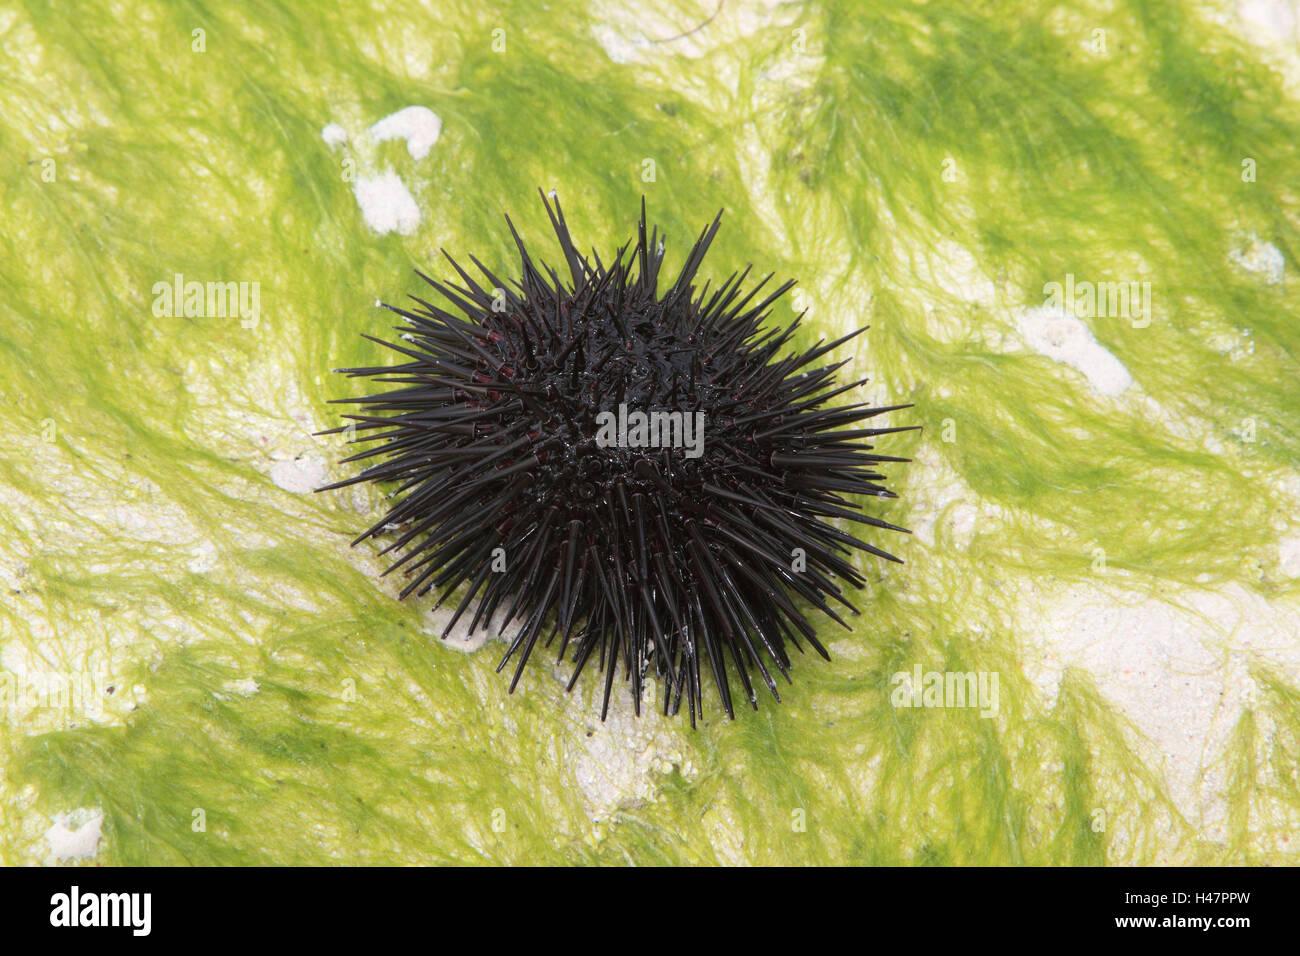 Sea urchin, - Stock Image